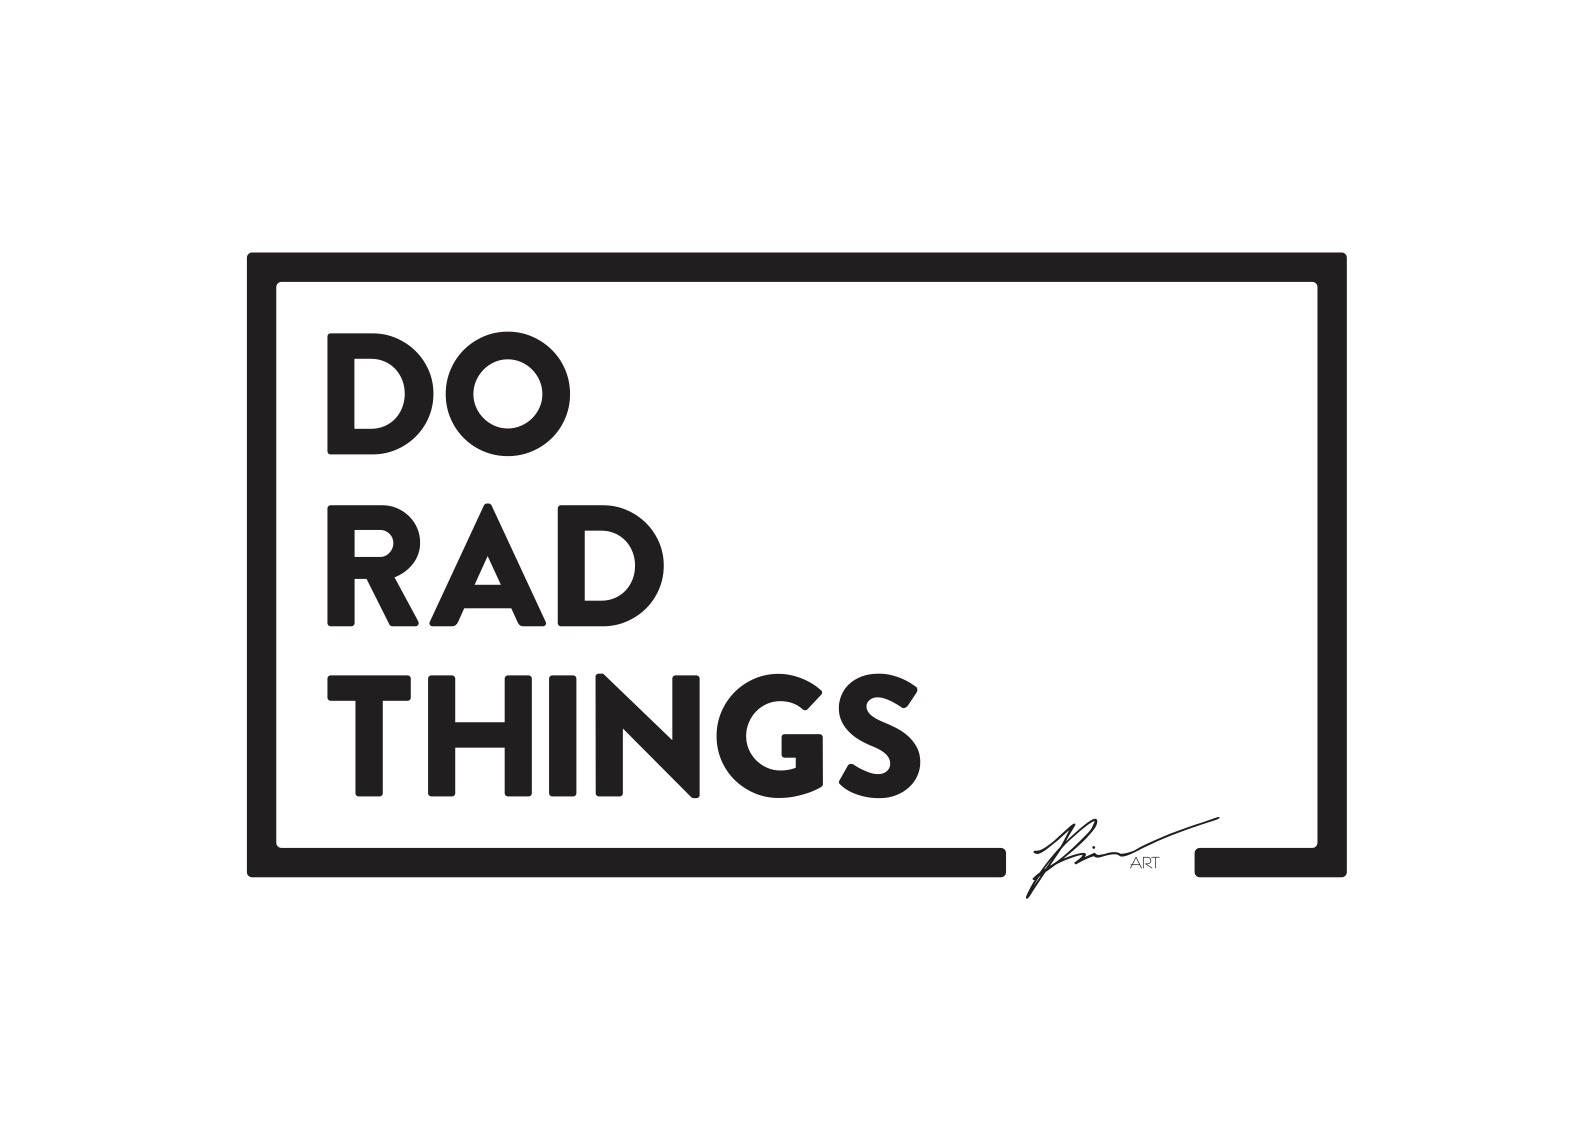 Do Rad Things: Skateboard Art Online Seminar